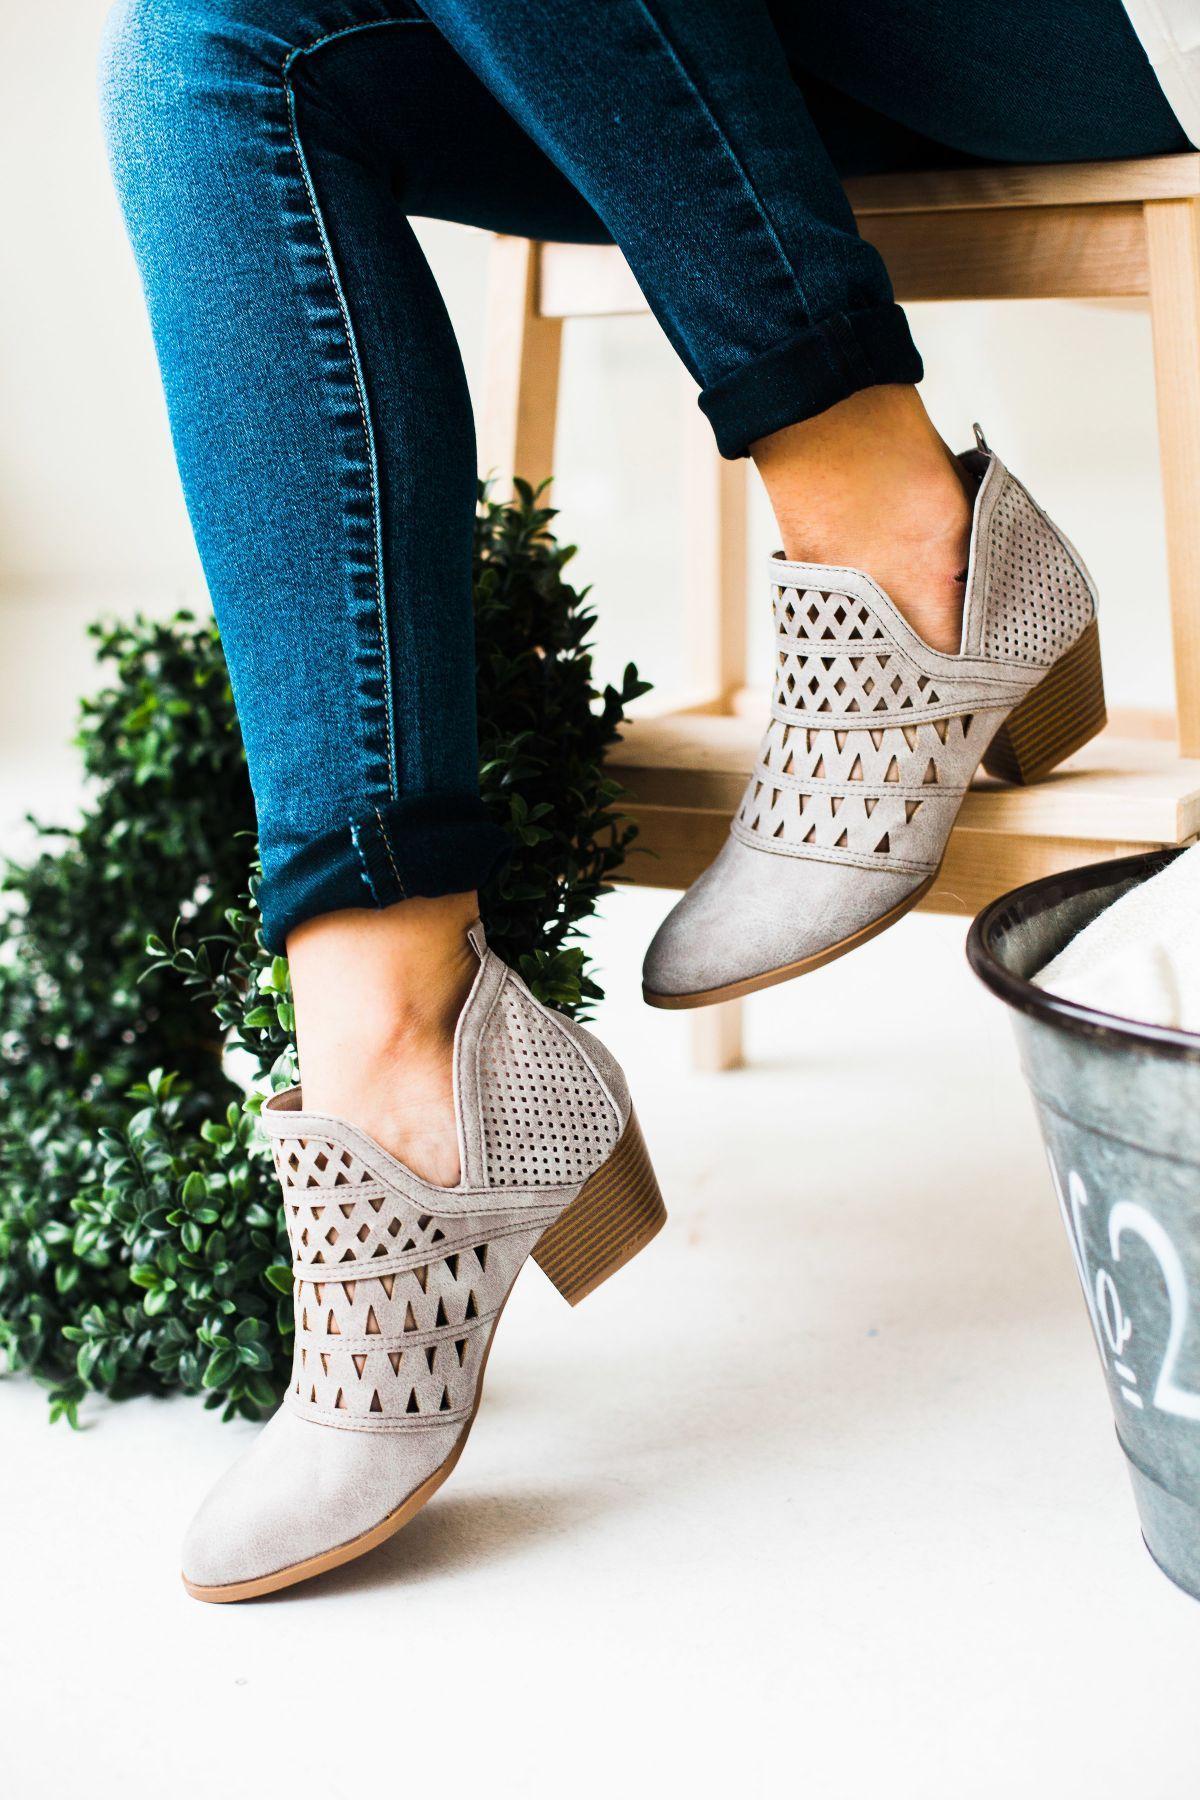 12+ Sensual Shoes Mens Ideas in 2019 Jordan ShoesKontor Jordan Shoes Office